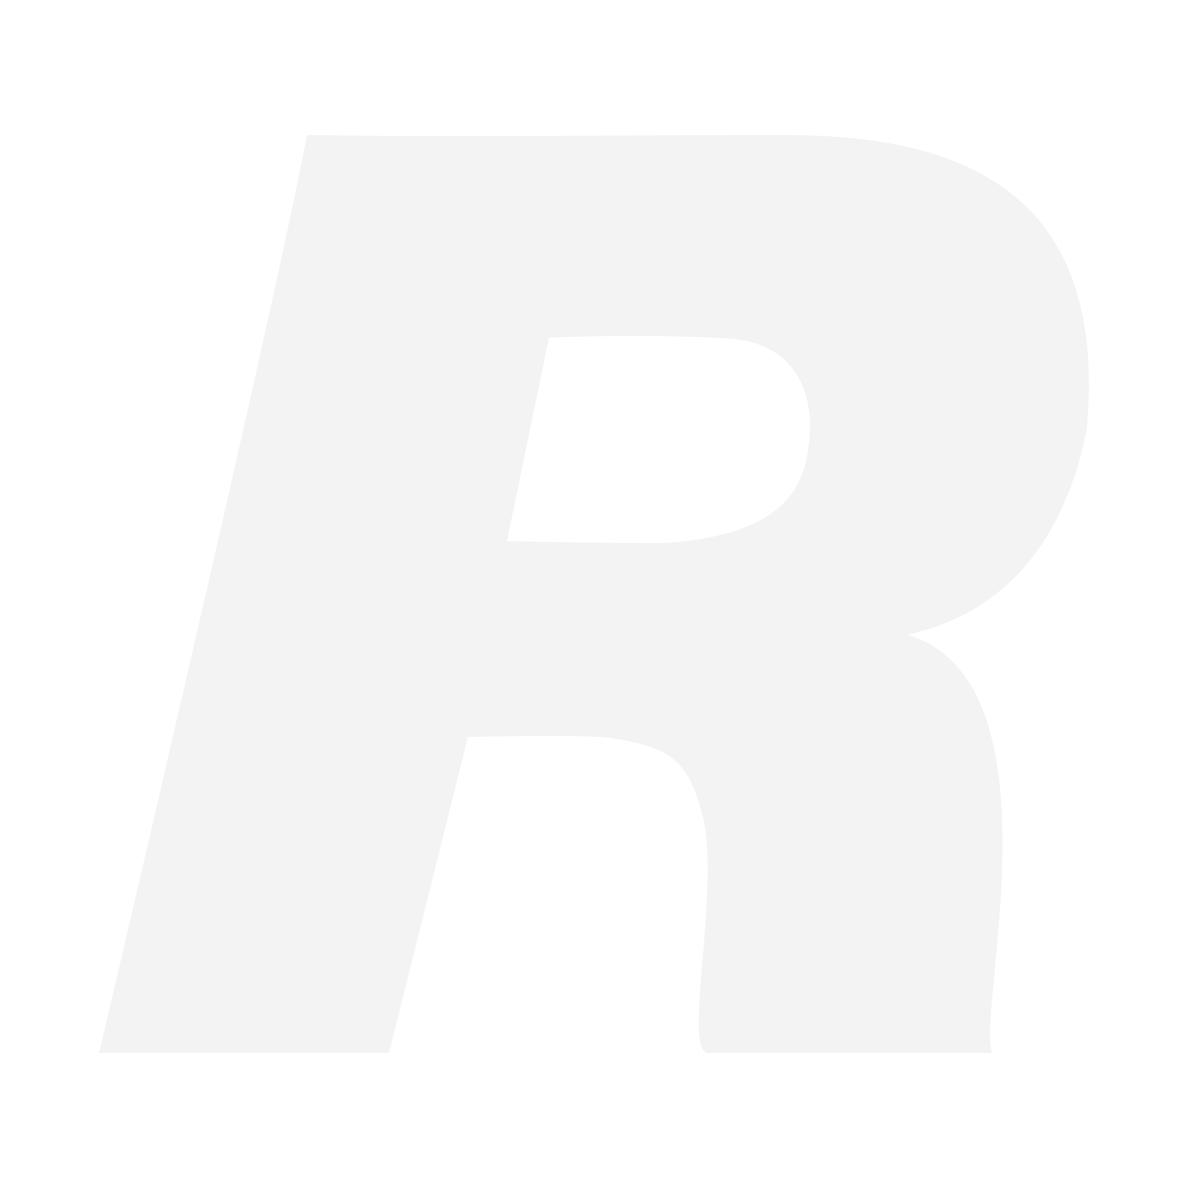 Fujifilm RDP Provia 100F 135-36 diafilm